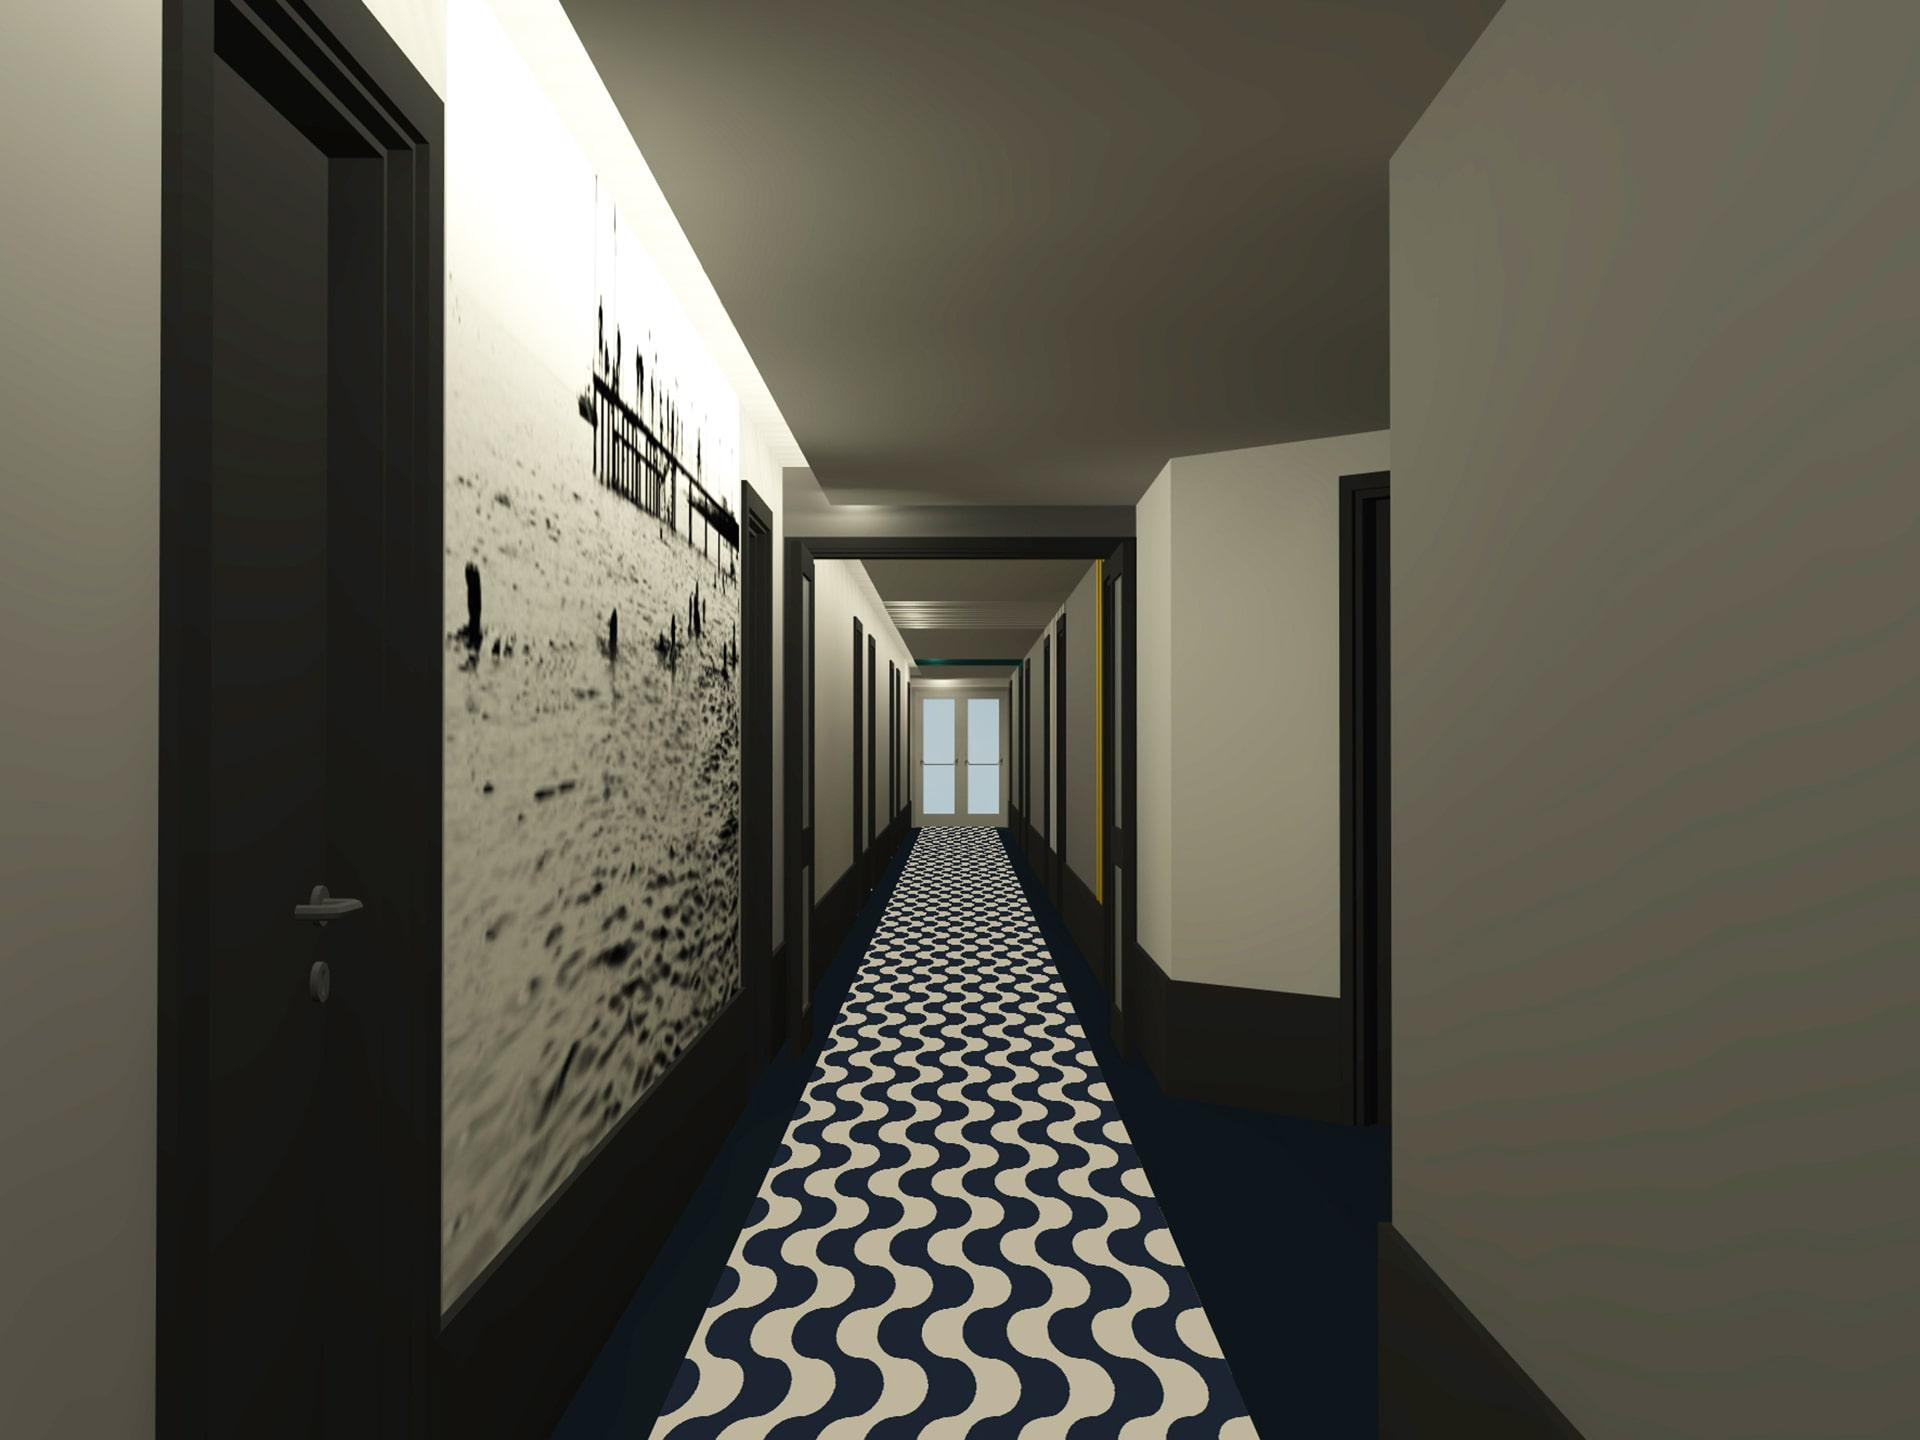 Architecte à Lille - Renovation Hotel VR architecture Design